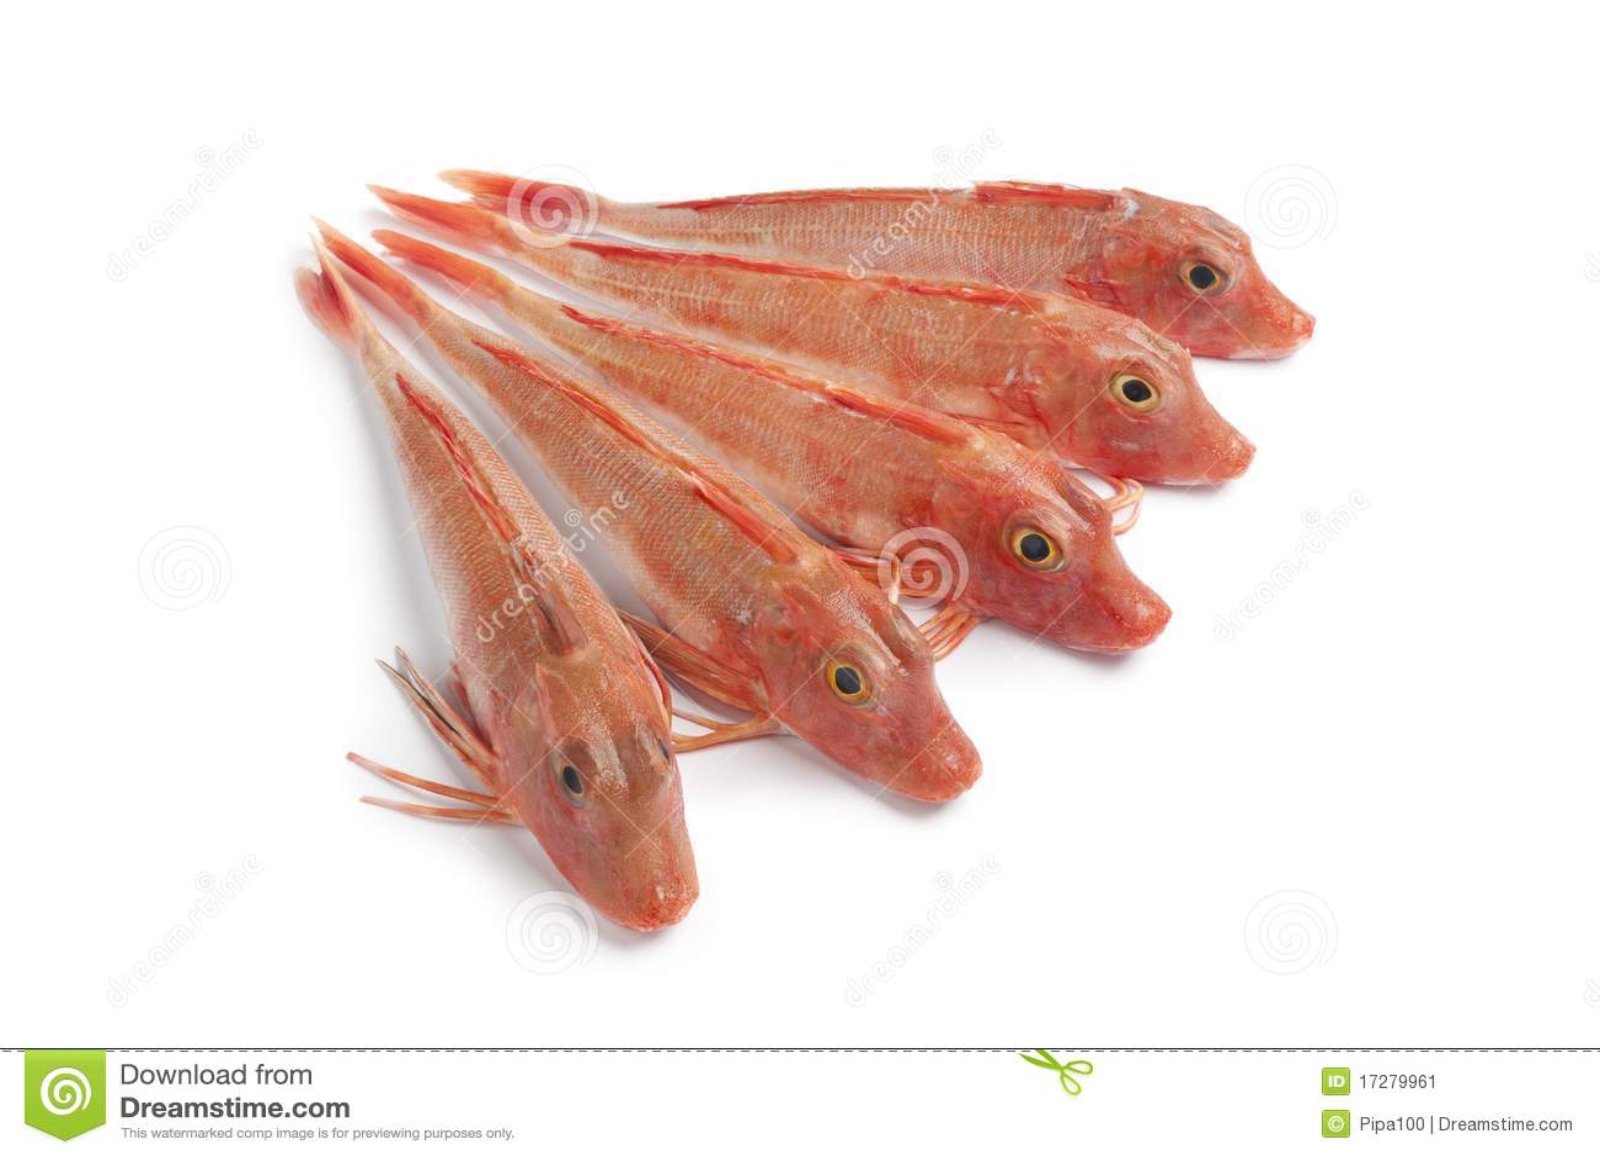 Pesci rossi freschi del capone di vasca immagine stock for Vasca x pesci rossi